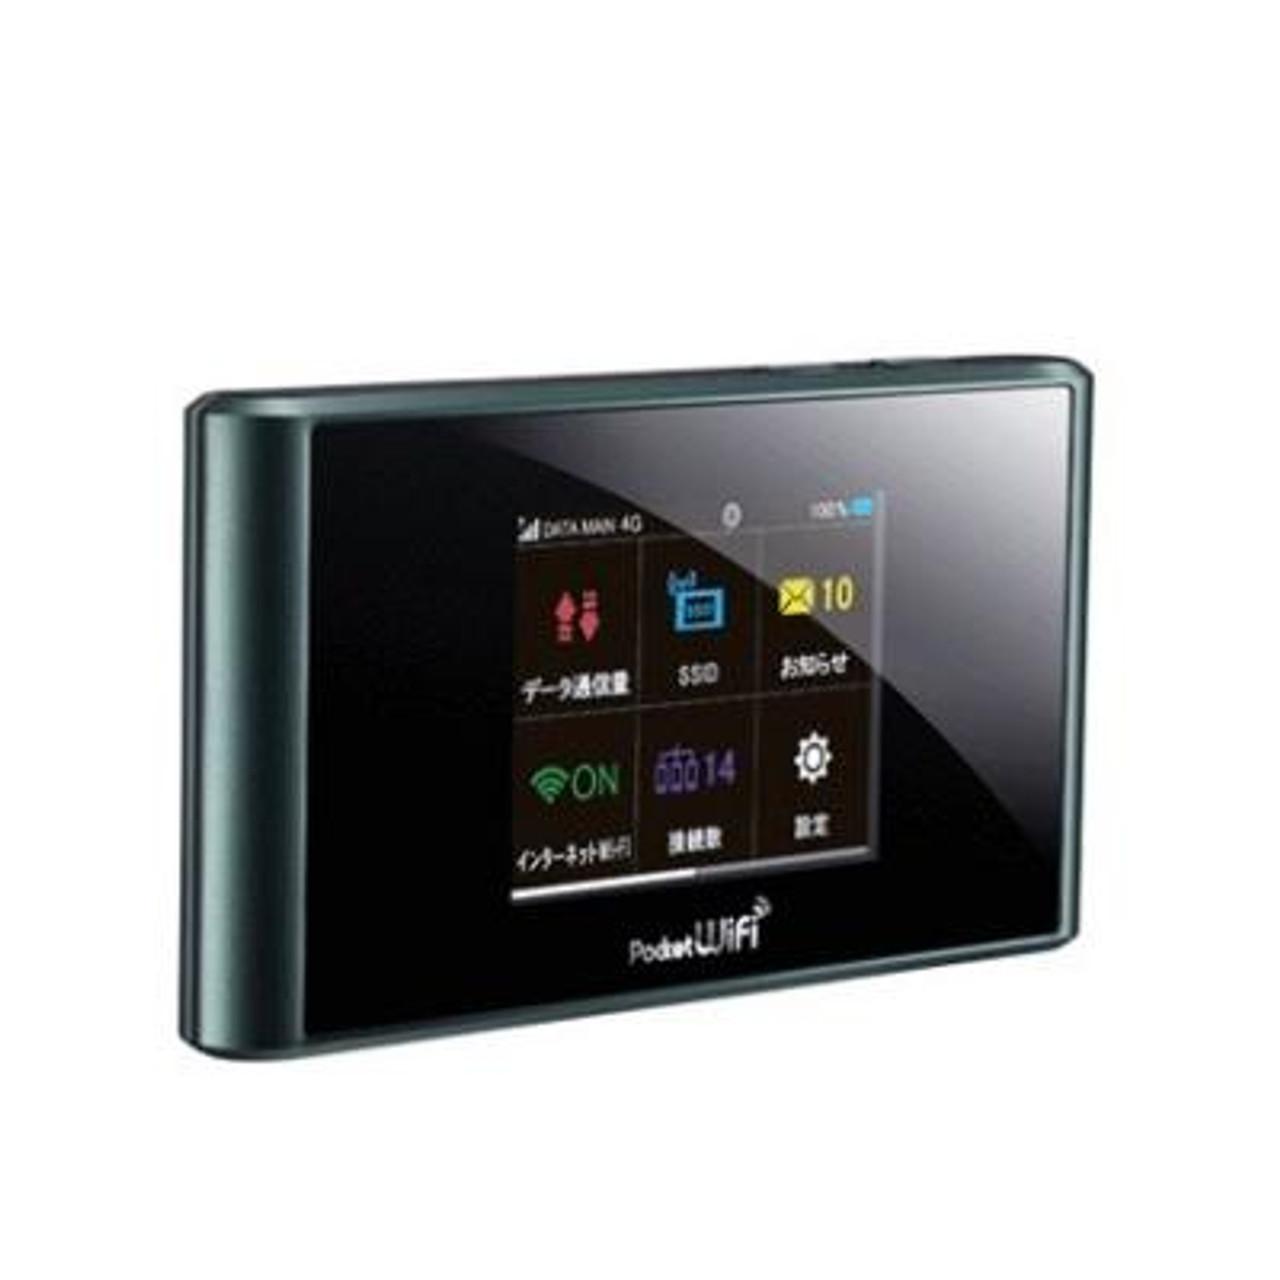 ZTE Softbank 303zt LTE 4G WiFi pocket router unlocked